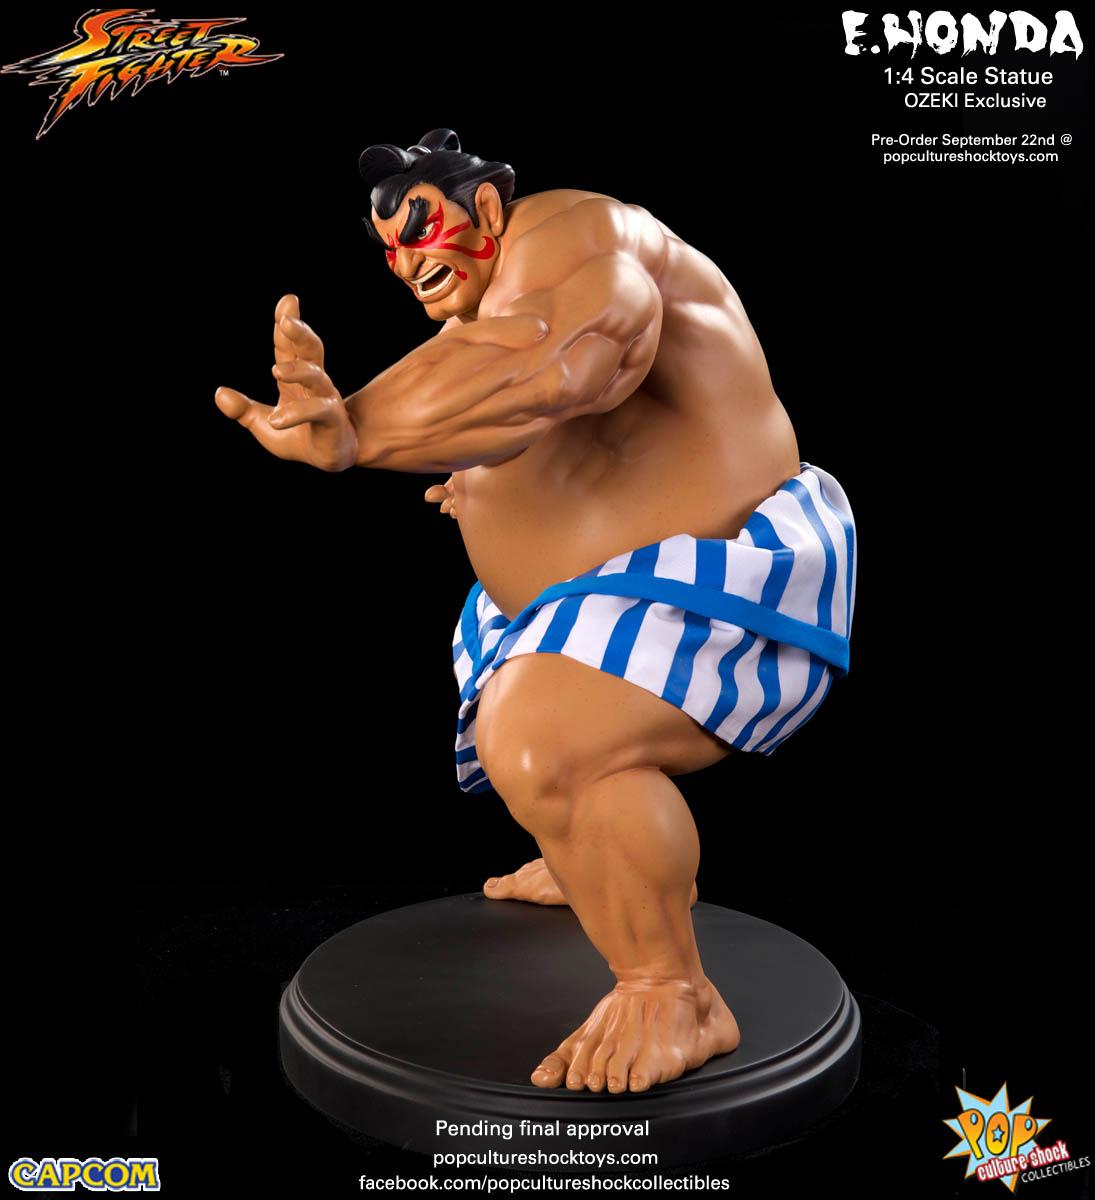 [Pop Culture Shock] Street Fighter: E. Honda 1/4 Statue - Página 3 Street-Fighter-E.-Honda-ozeki-Statue-009